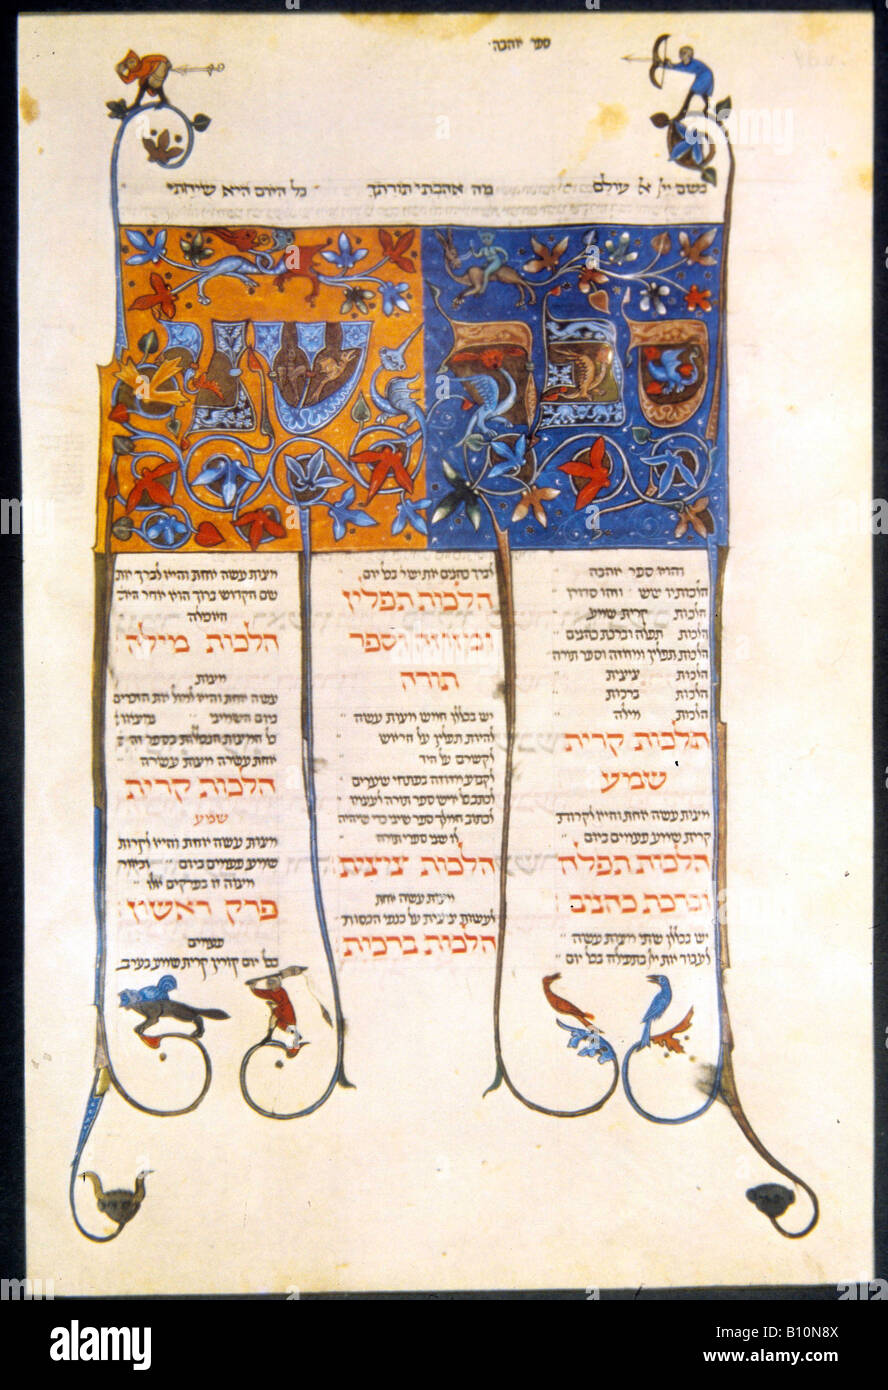 Mishneh Torah of Maimonides Book of Love mythological animals 1295 96 - Stock Image